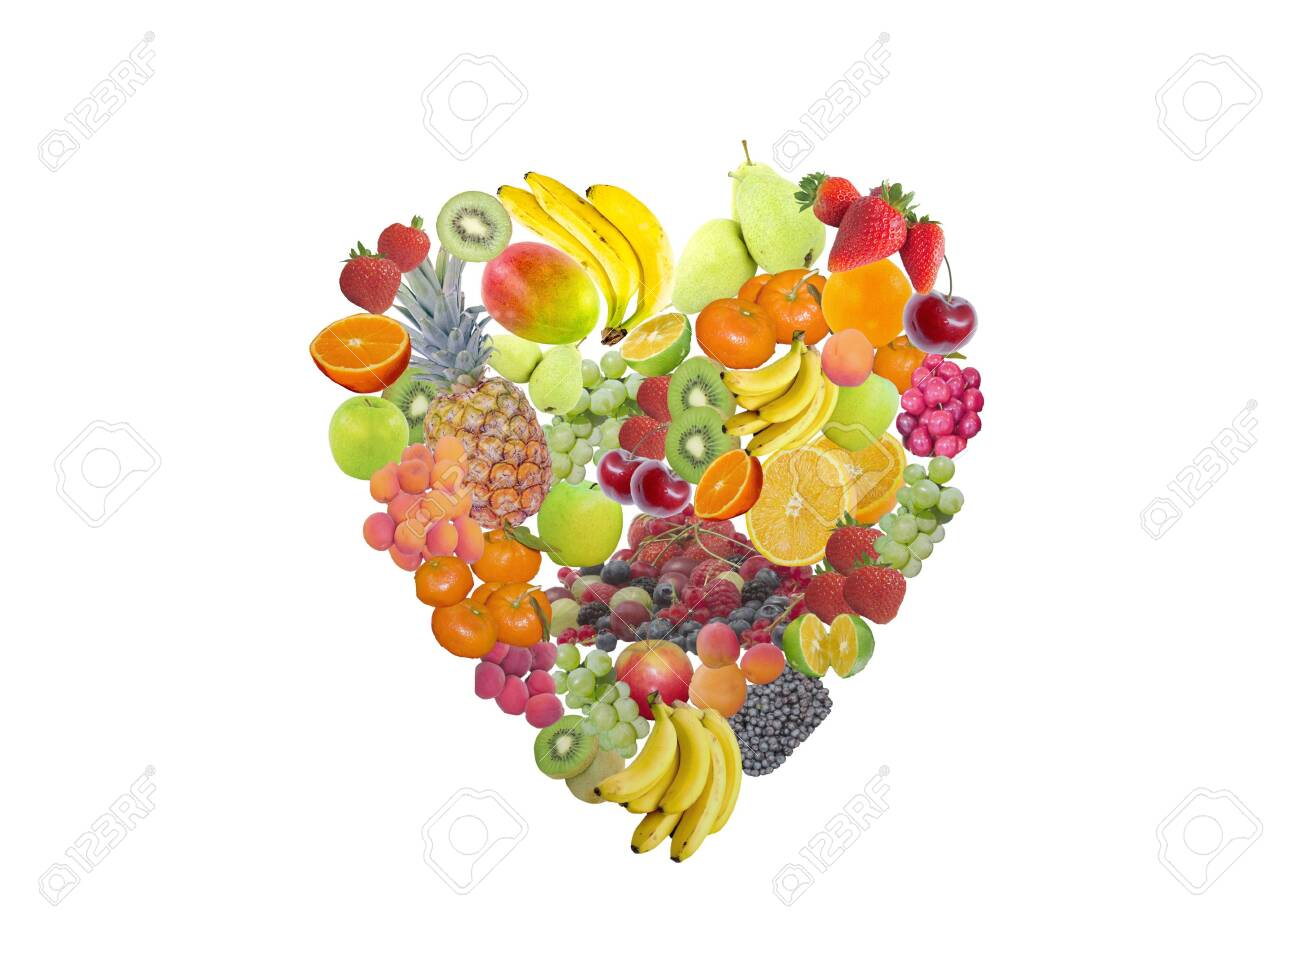 Heart full of different fruits on white - 154623228